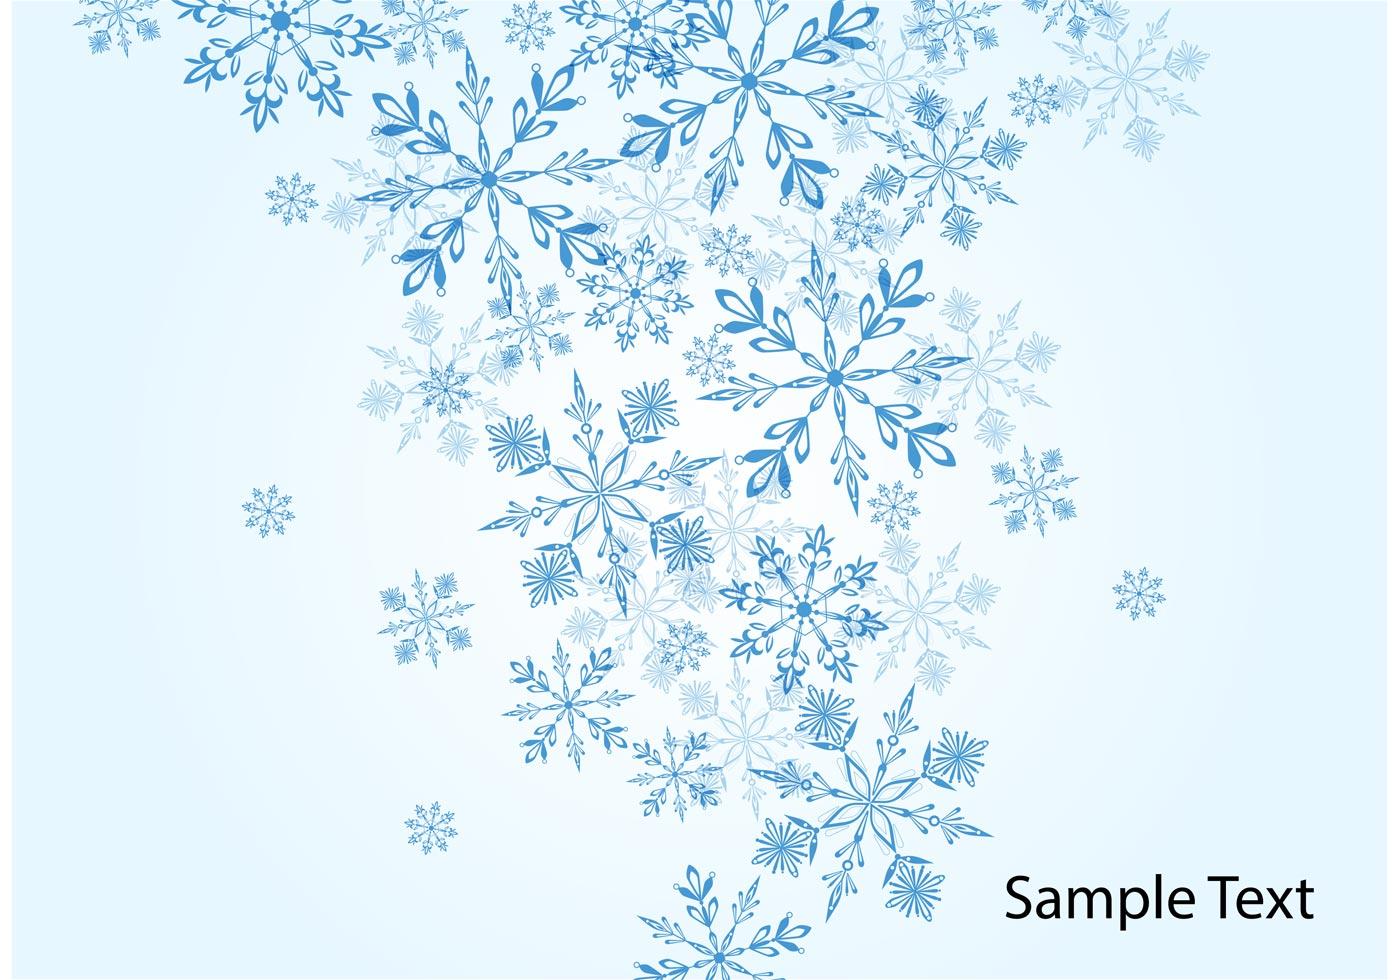 winter snowflake vector background download free vectors. Black Bedroom Furniture Sets. Home Design Ideas